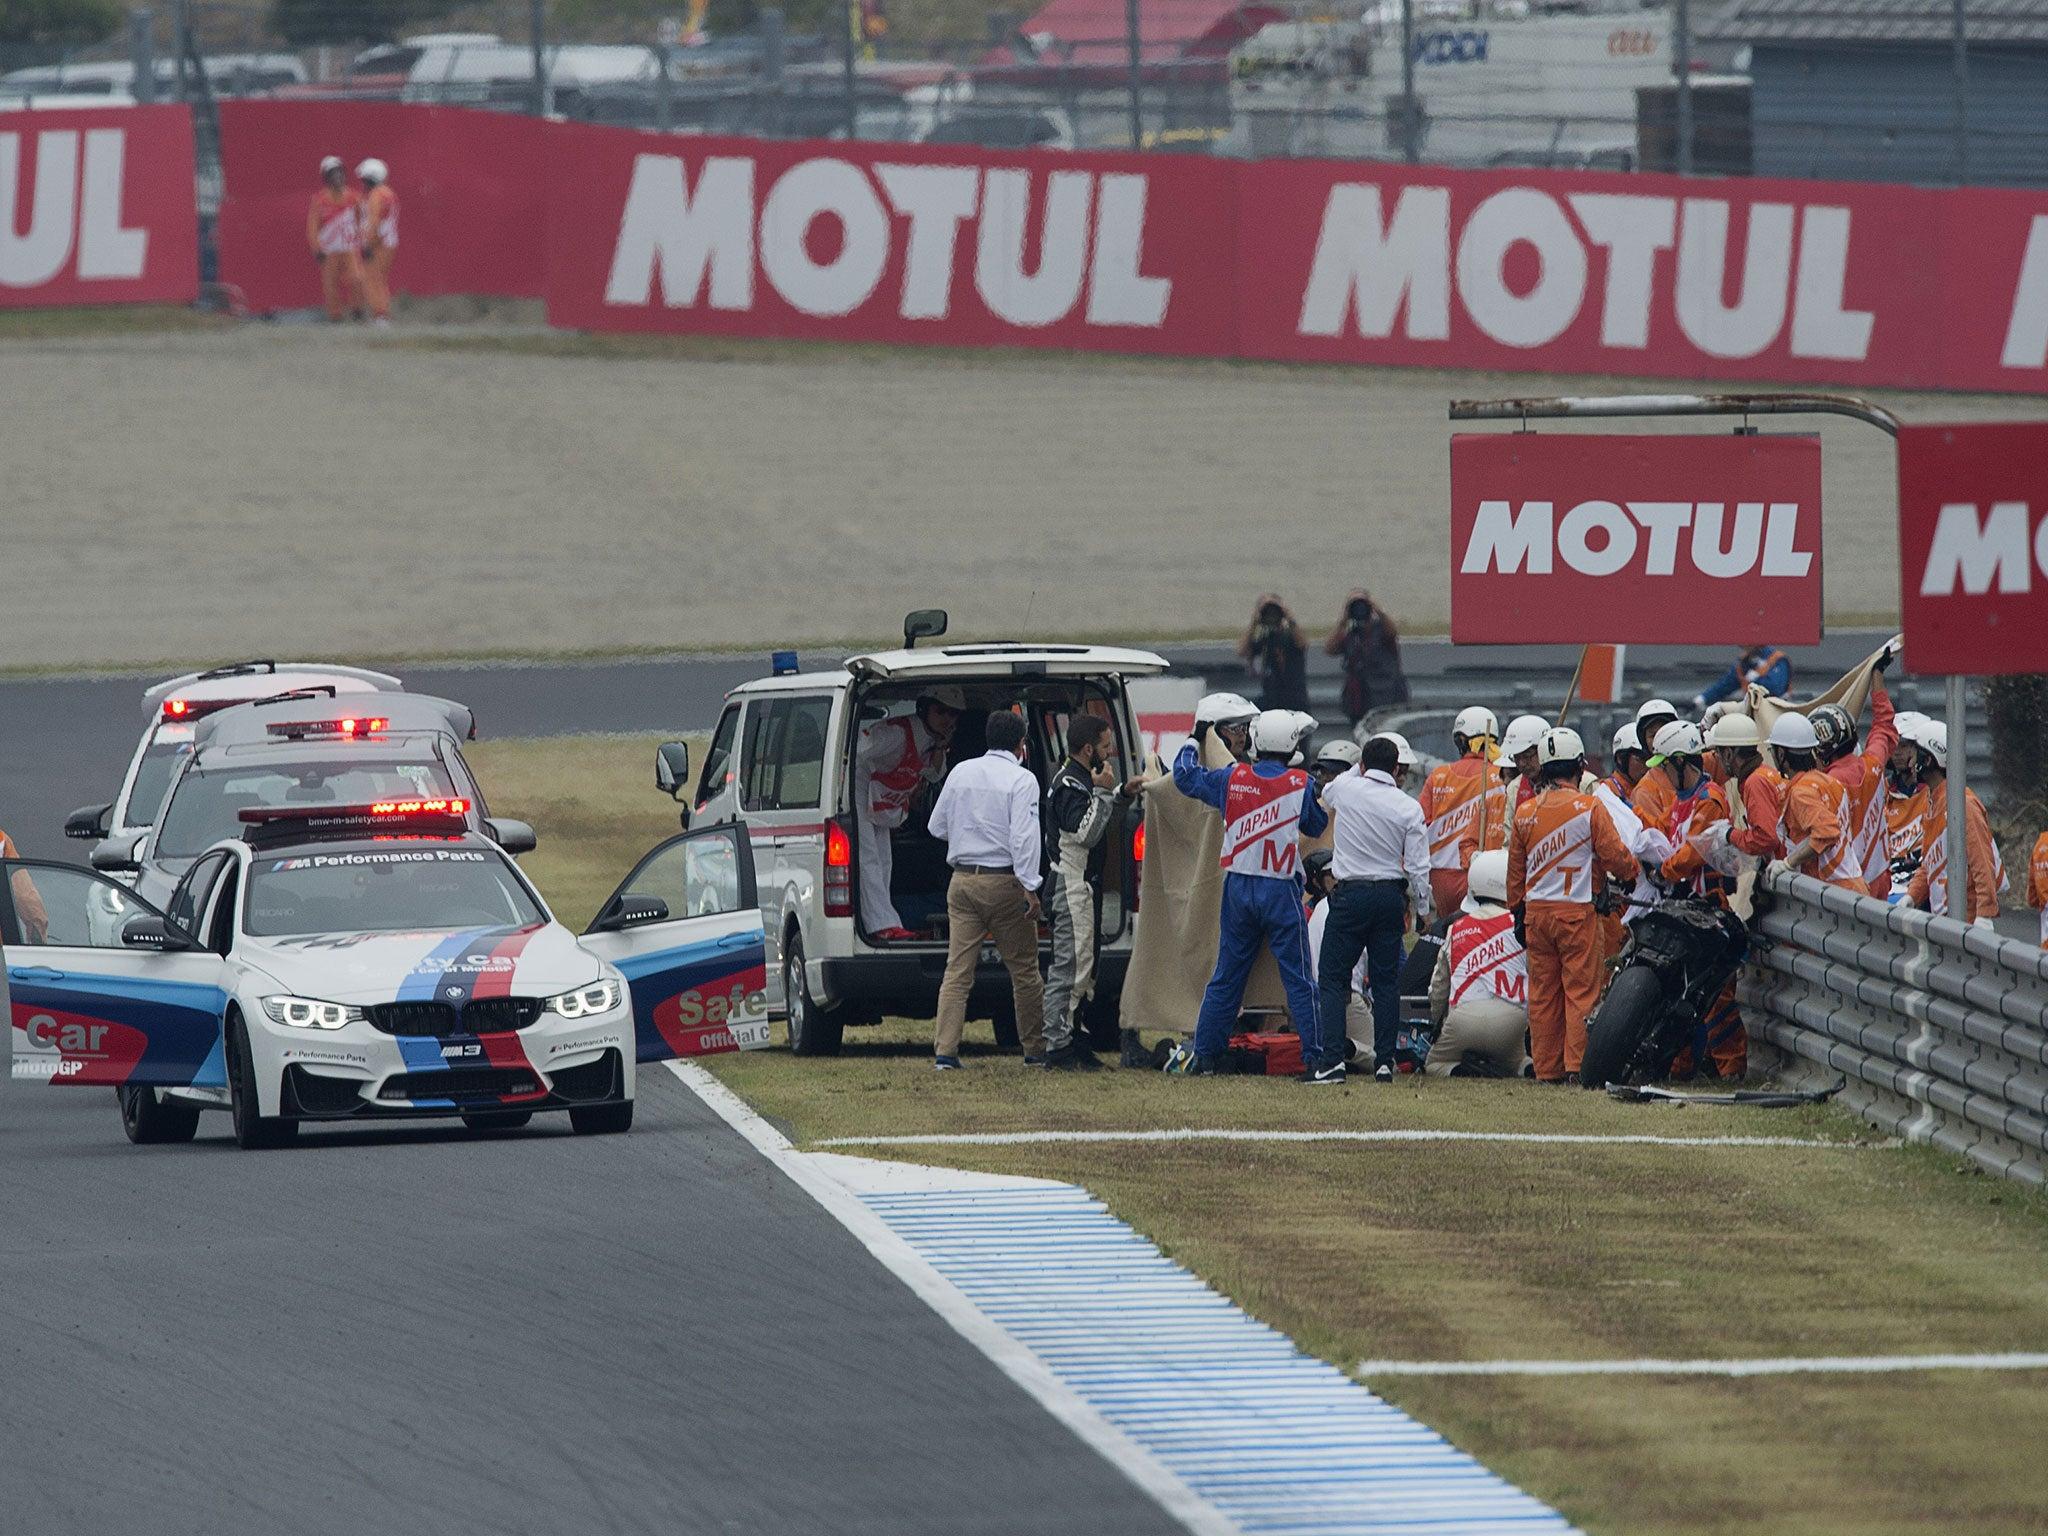 Alex de Angelis injury latest: MotoGP rider 'able to talk